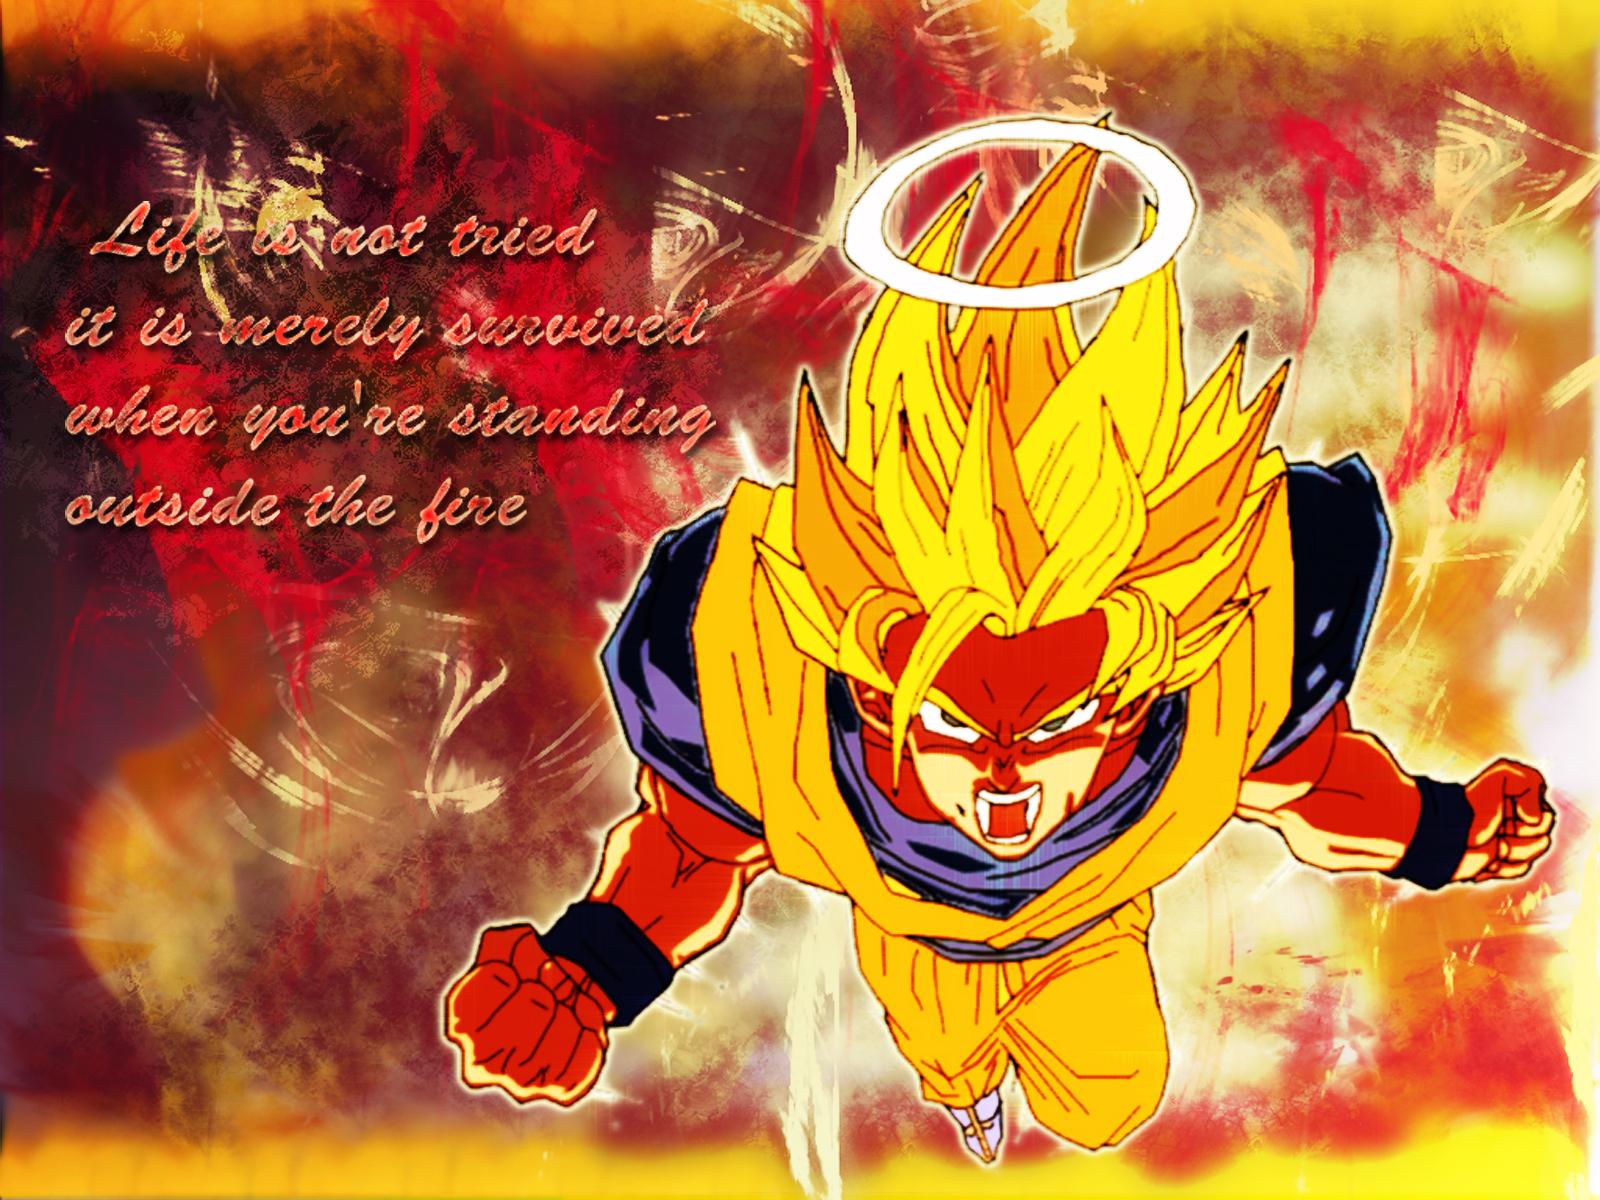 Dragon Ball Wallpaper: UA #4- Saiyan Fire - Minitokyo